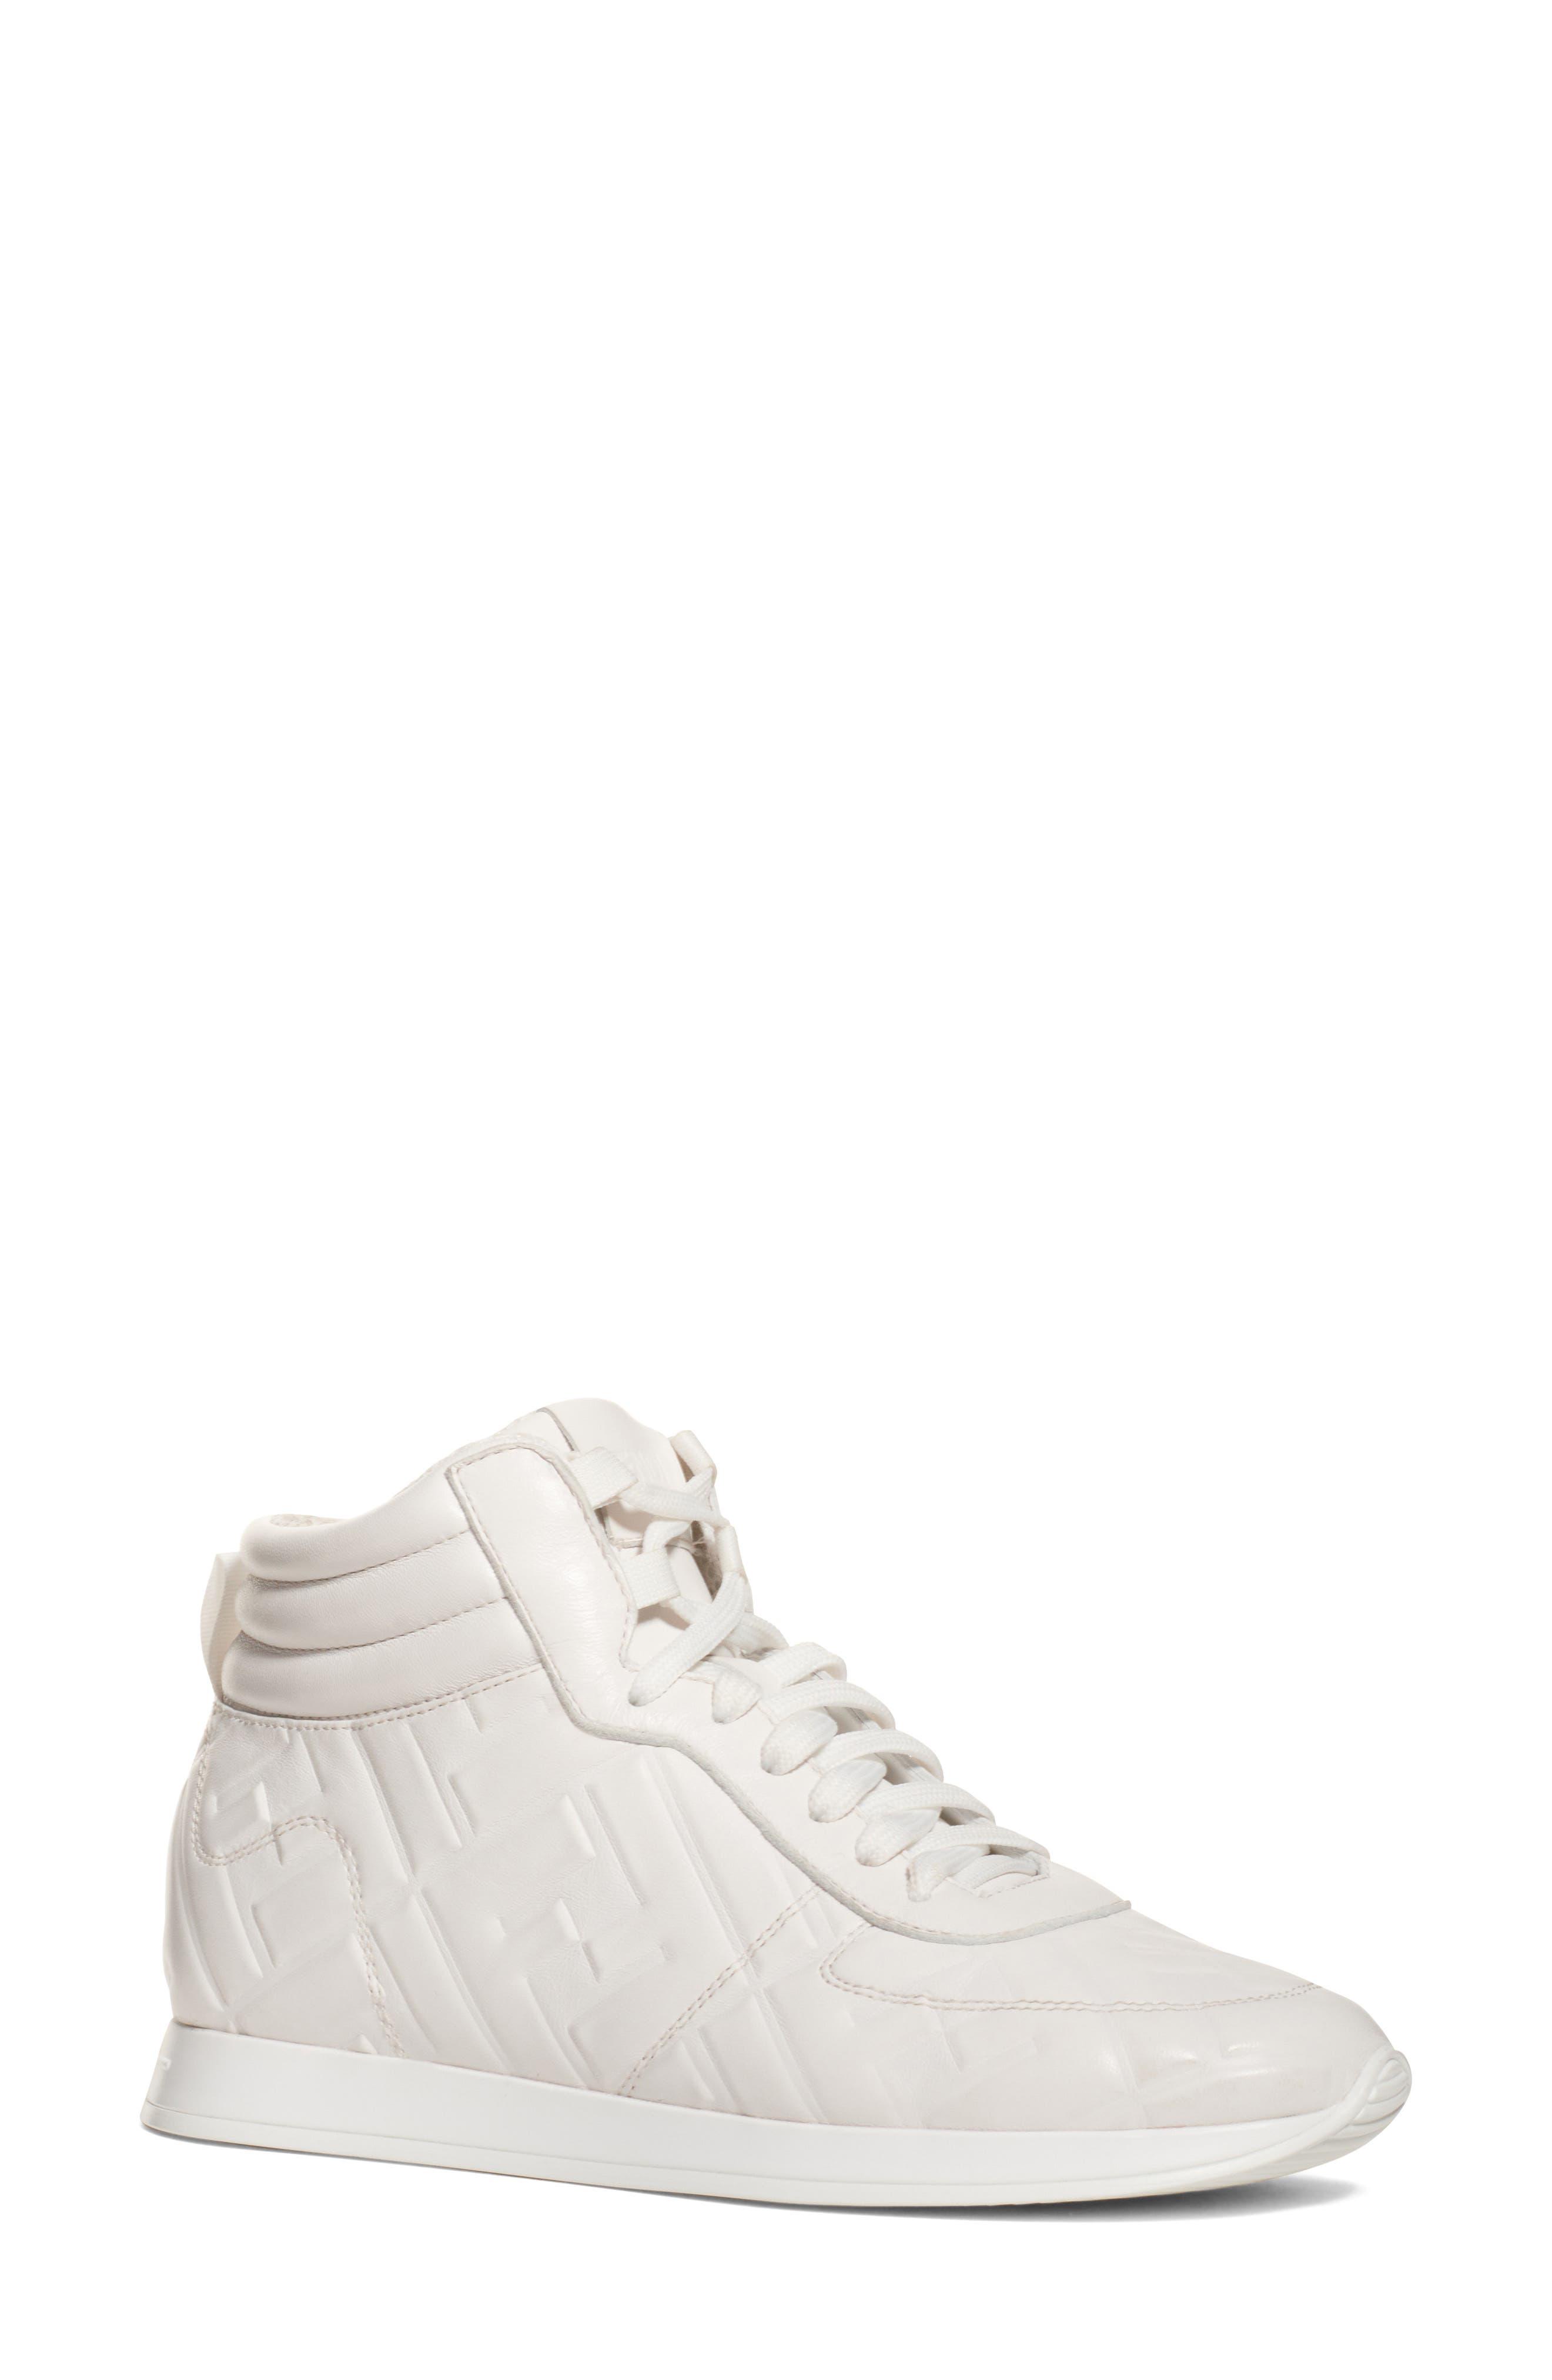 Women's Sneakers Fendi Shoes | Nordstrom